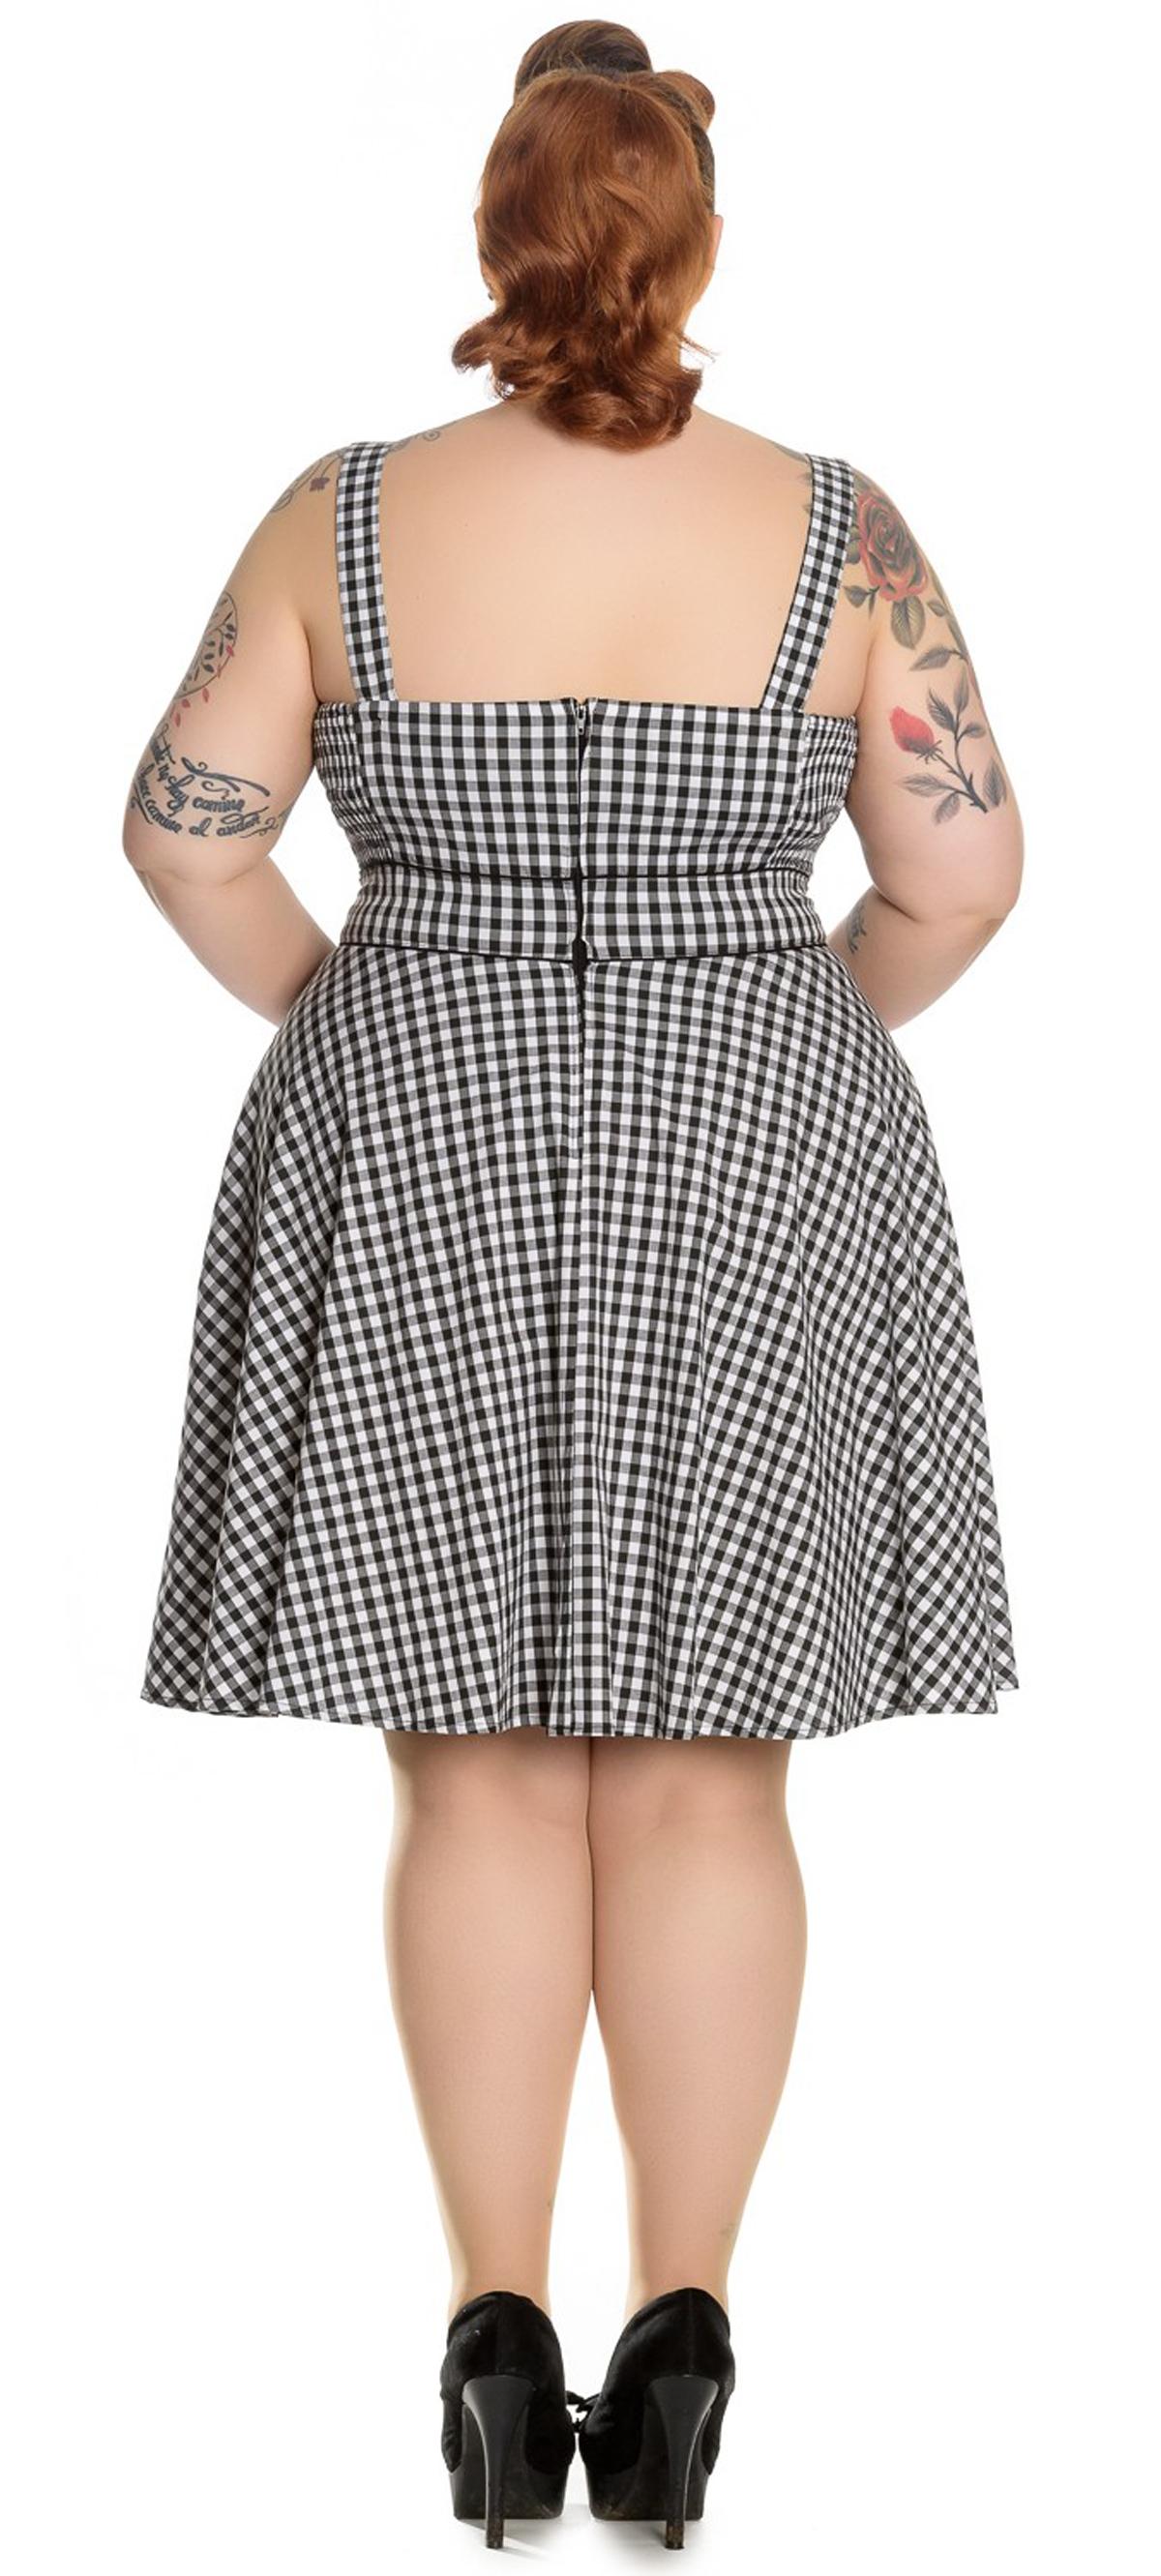 hell bunny bridget kurzarm pepita gingham 50s kleid dress plus size rockabilly. Black Bedroom Furniture Sets. Home Design Ideas